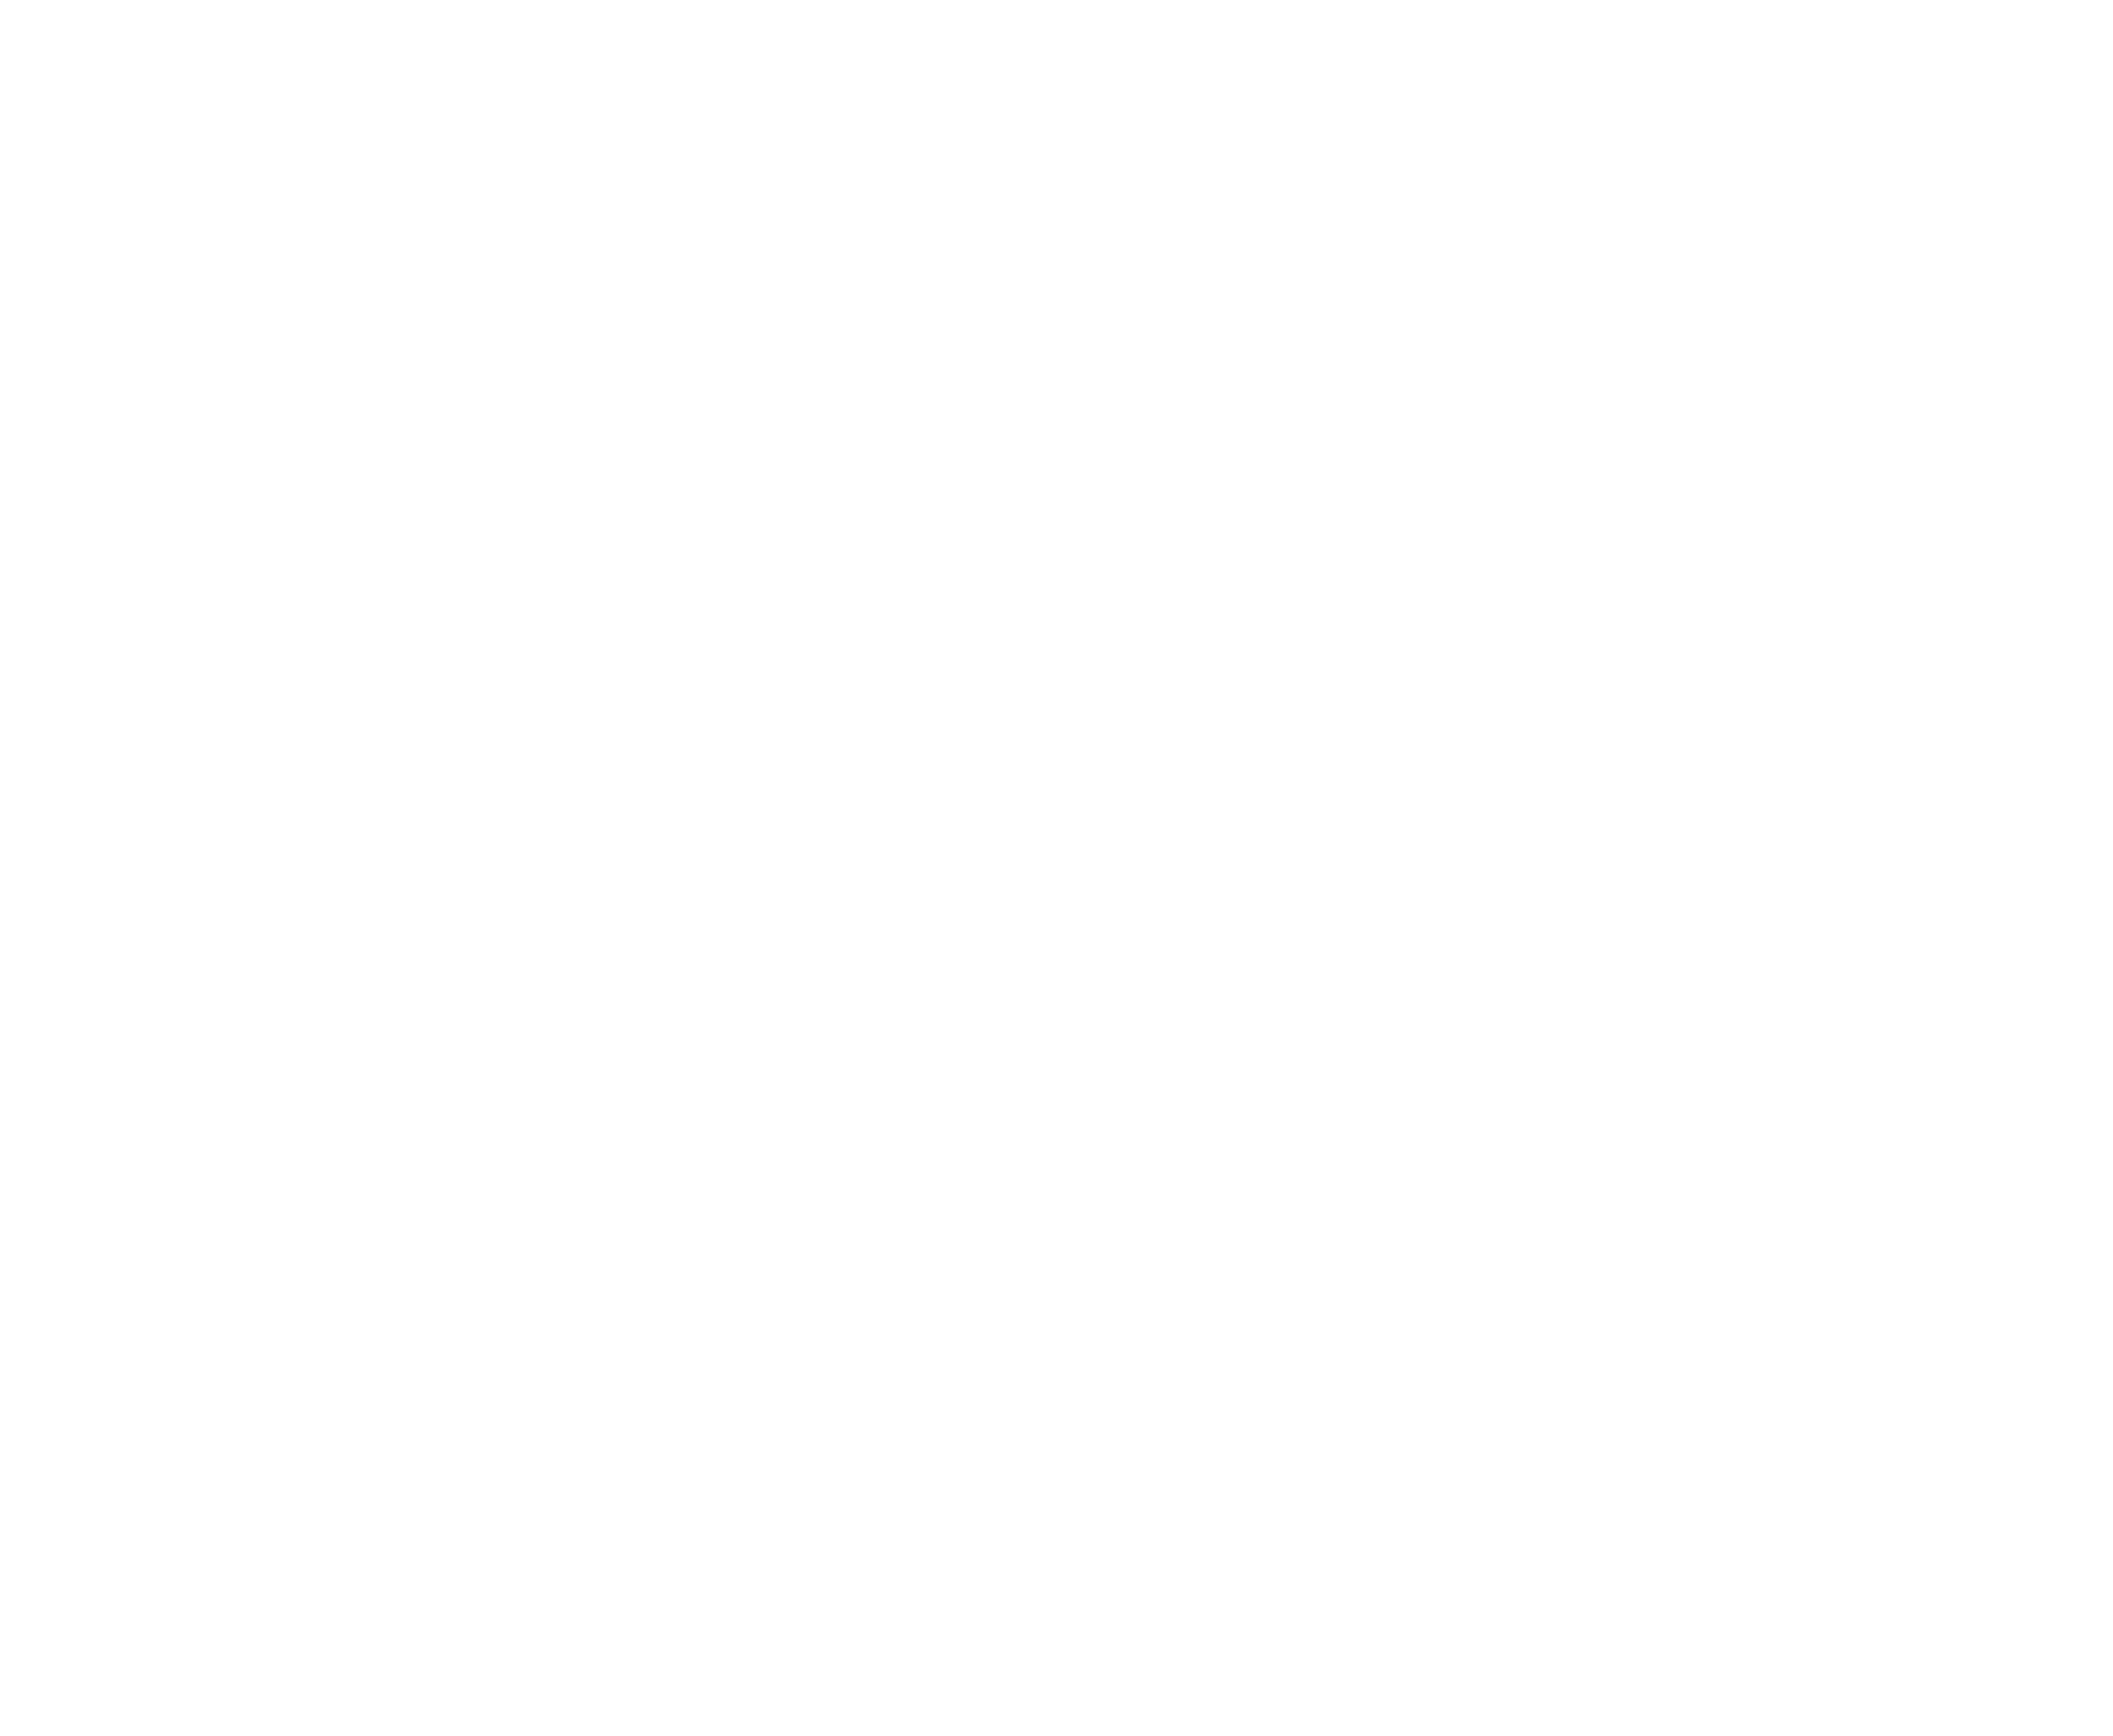 nuovo logo Istituto Universitario Pratesi bianco